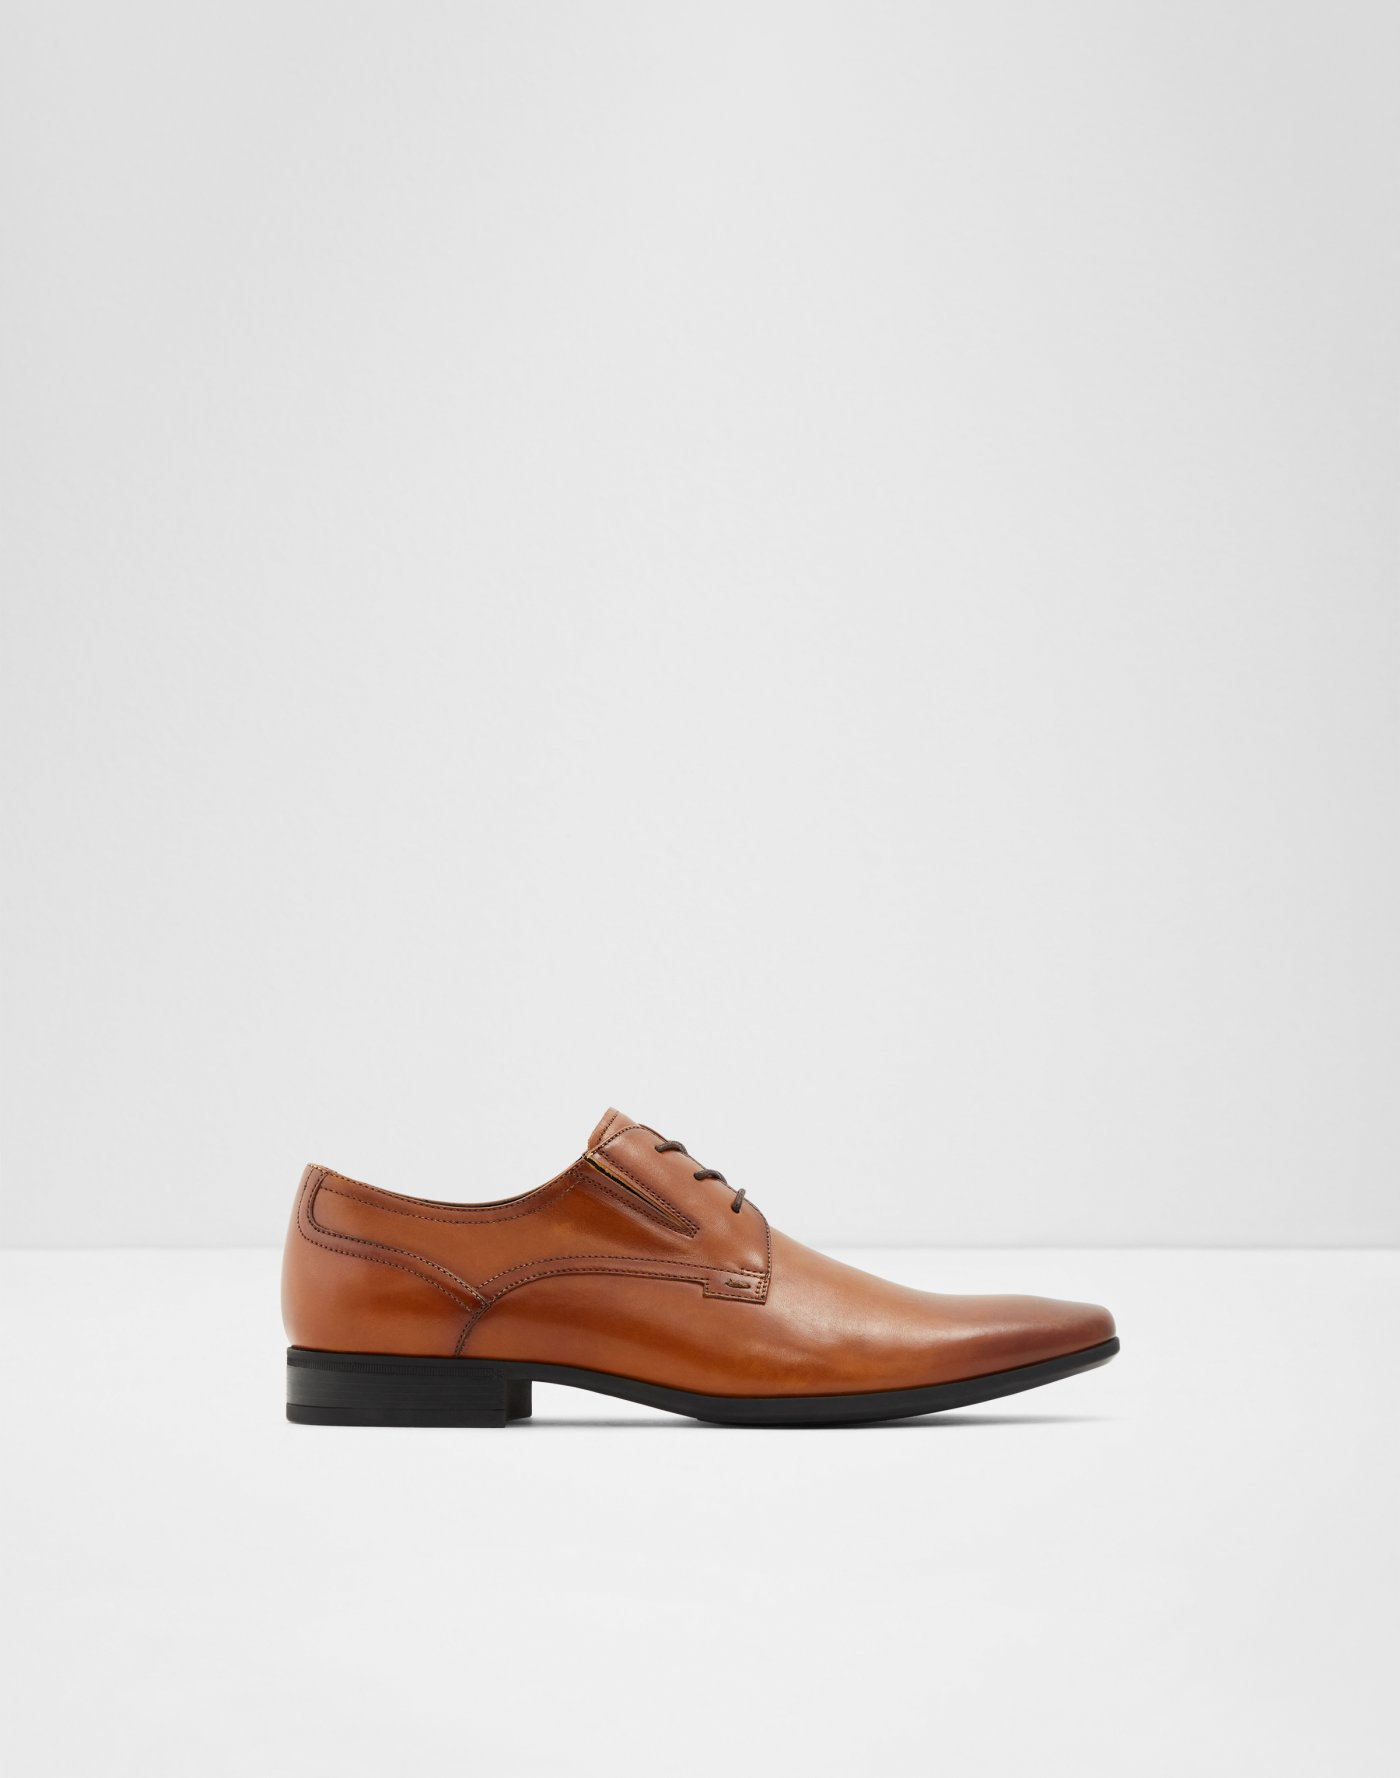 e434c1e2614c Dress shoes